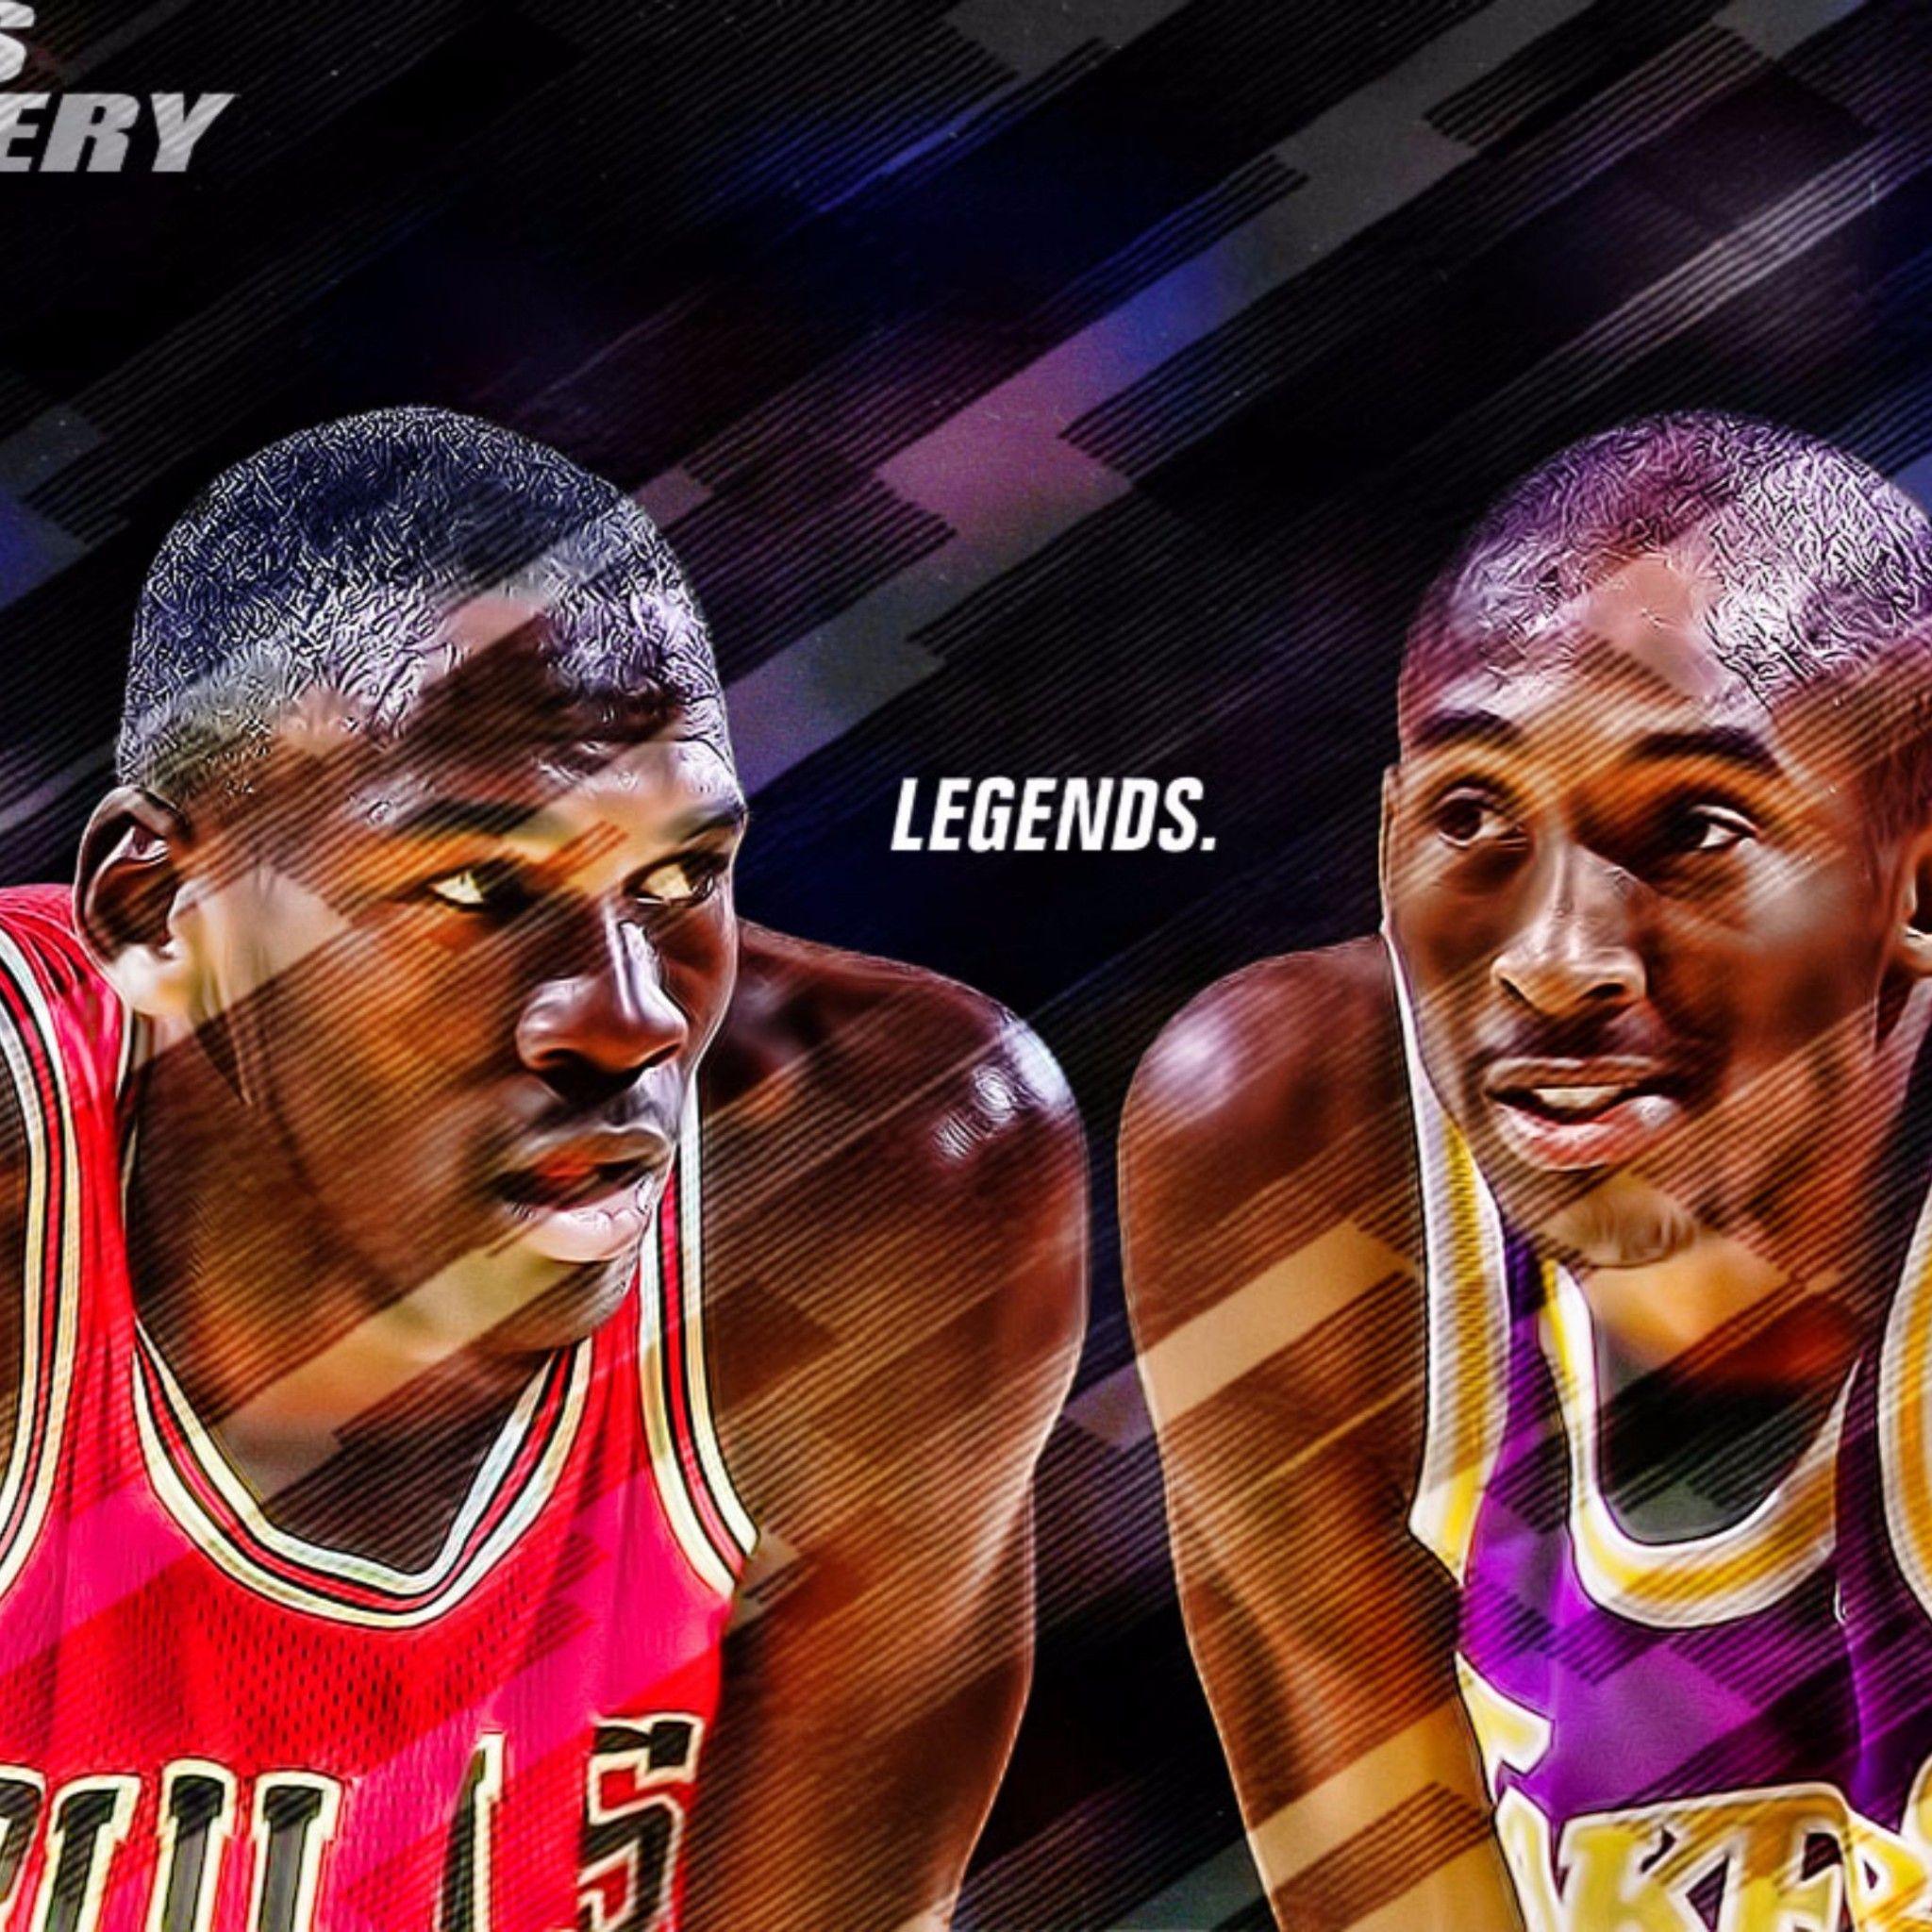 Jordan And Kobe Wallpapers Top Free Jordan And Kobe Backgrounds Wallpaperaccess